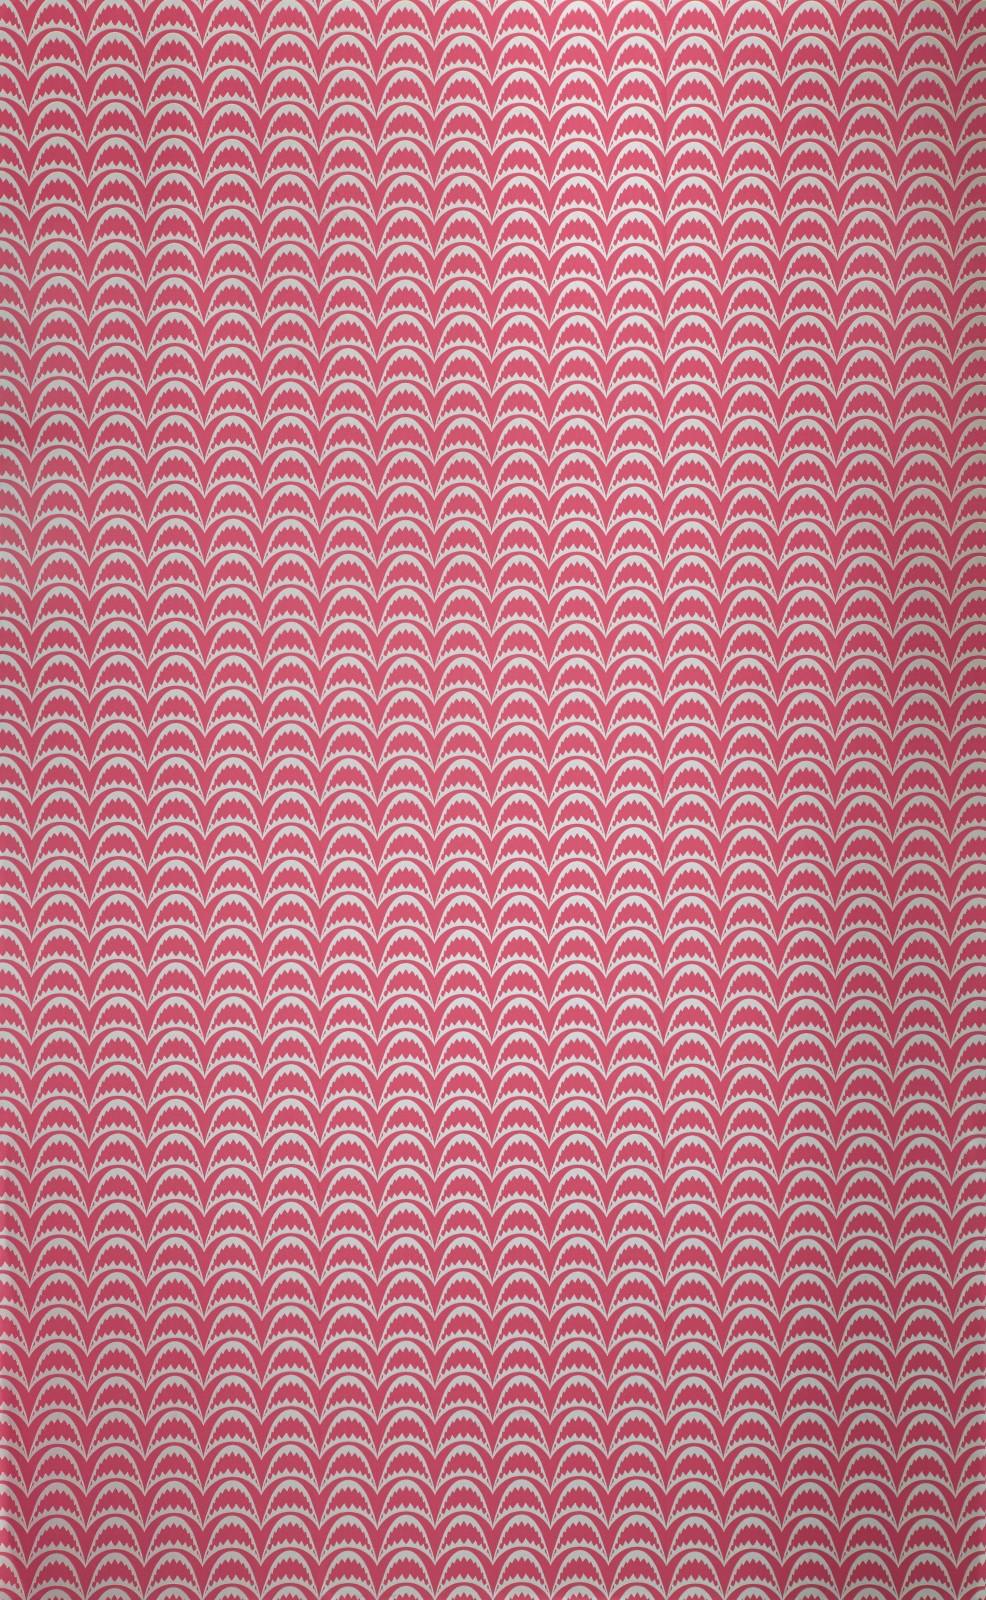 Arcade Wallpaper Raspberry